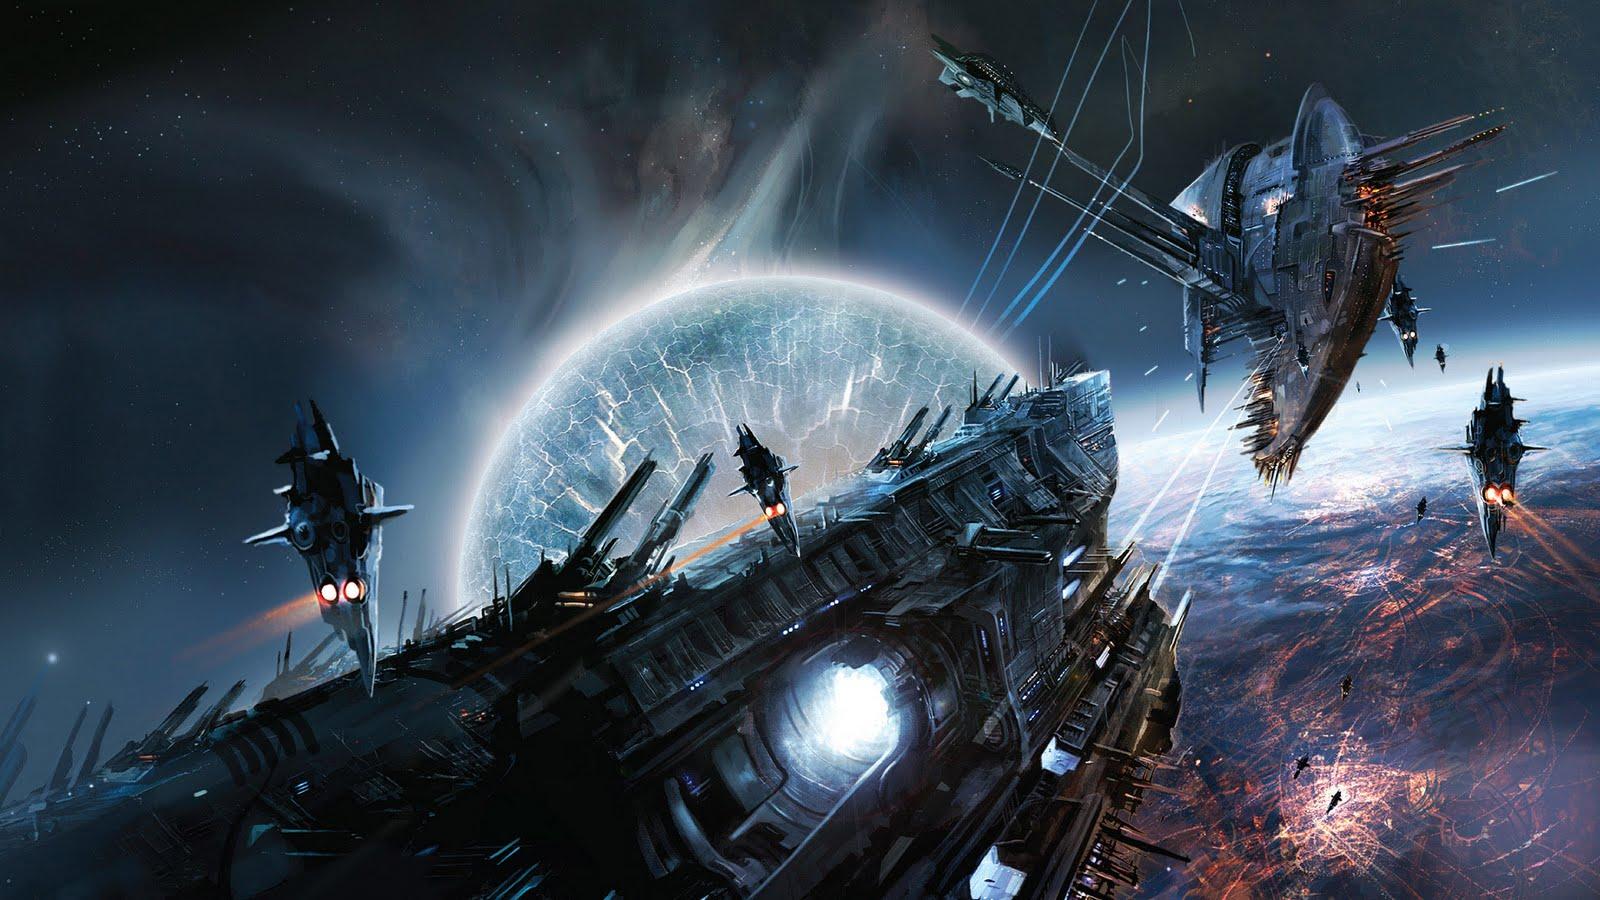 http://1.bp.blogspot.com/-Gn7cKFV2hUs/TkEXHUP8_9I/AAAAAAAAD-0/NmM04gnb_g0/s1600/Game_Scenes_Wallpapers_HD.jpg